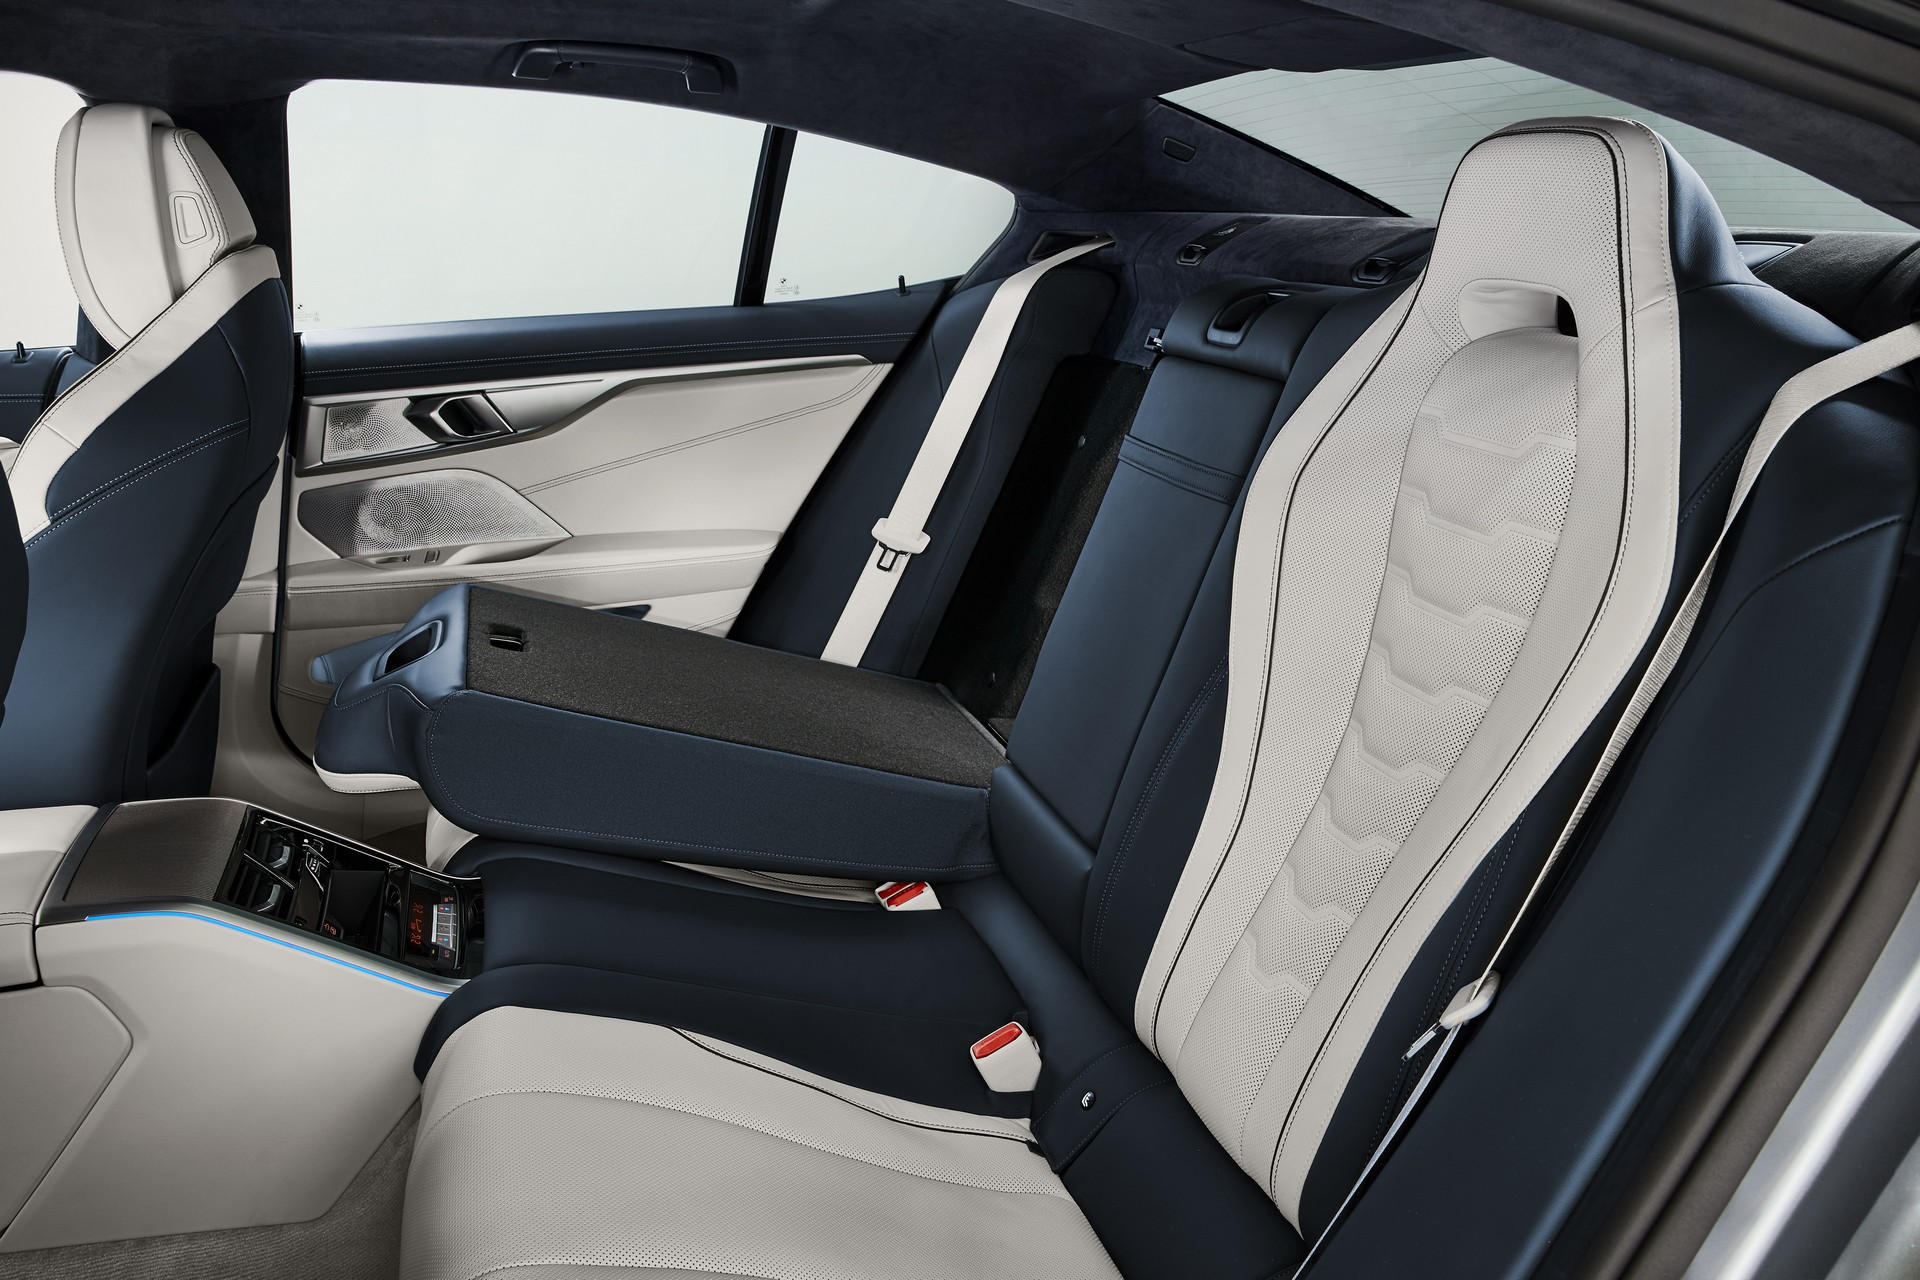 2020-bmw-8-series-gran-coupe-14.jpg